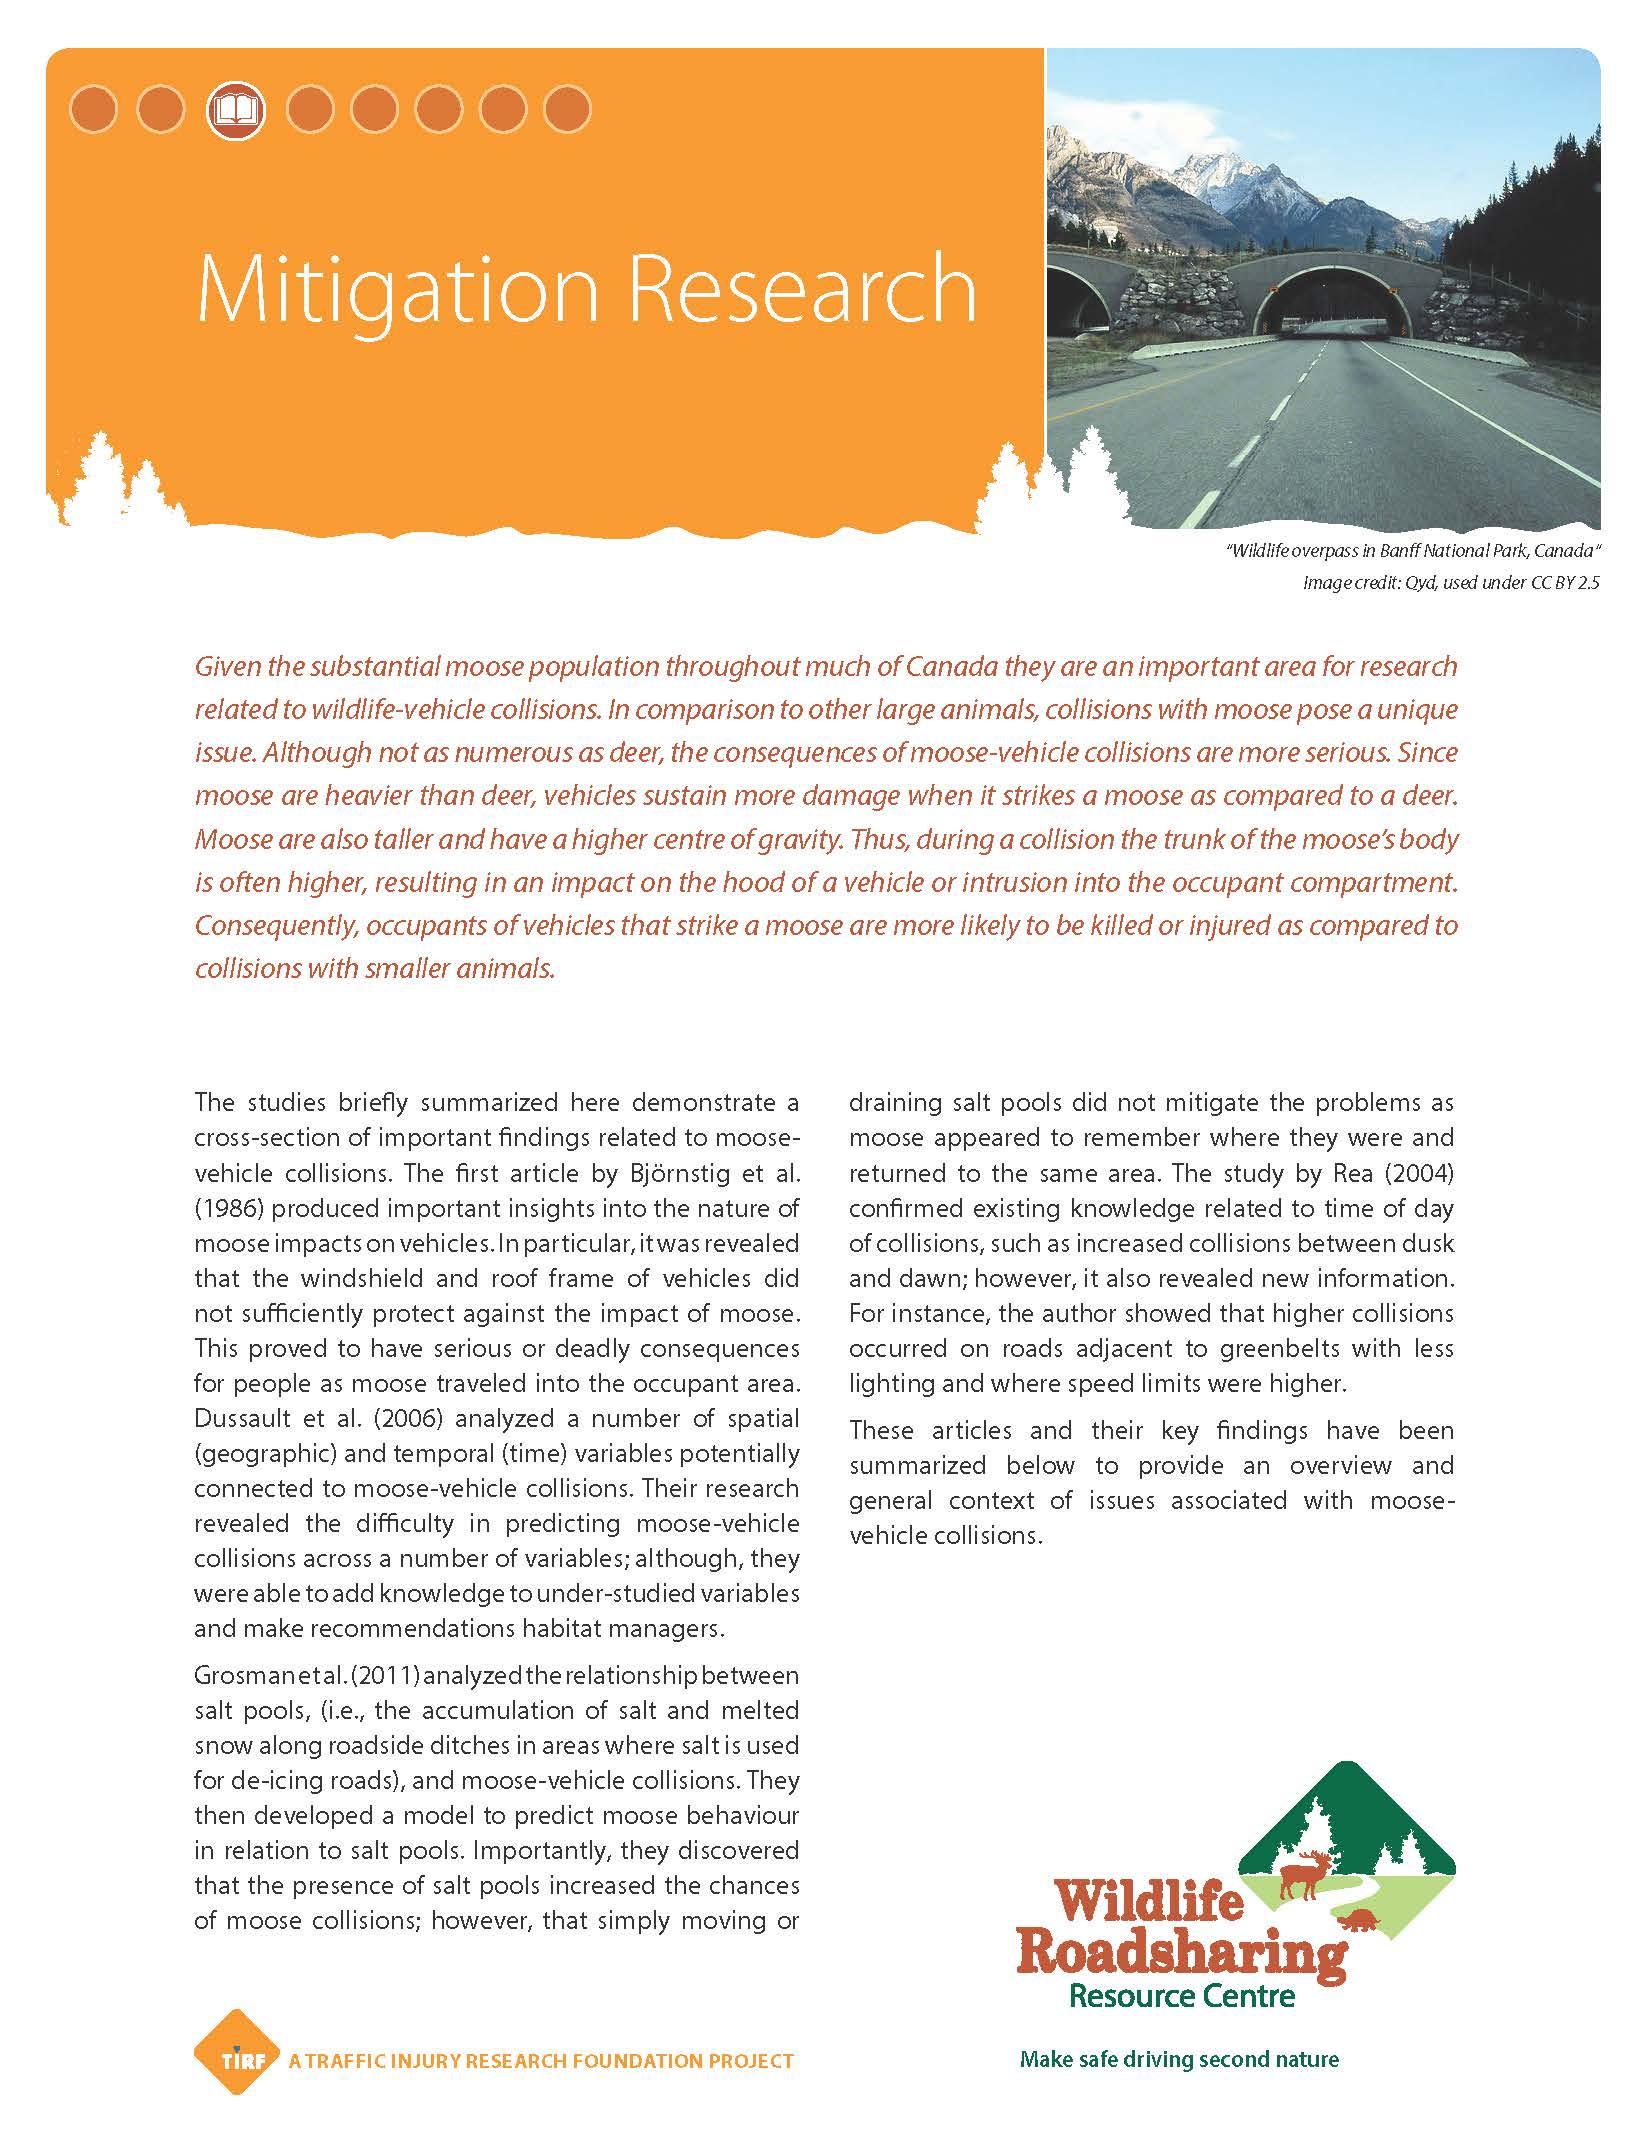 Mitigation Research Handout